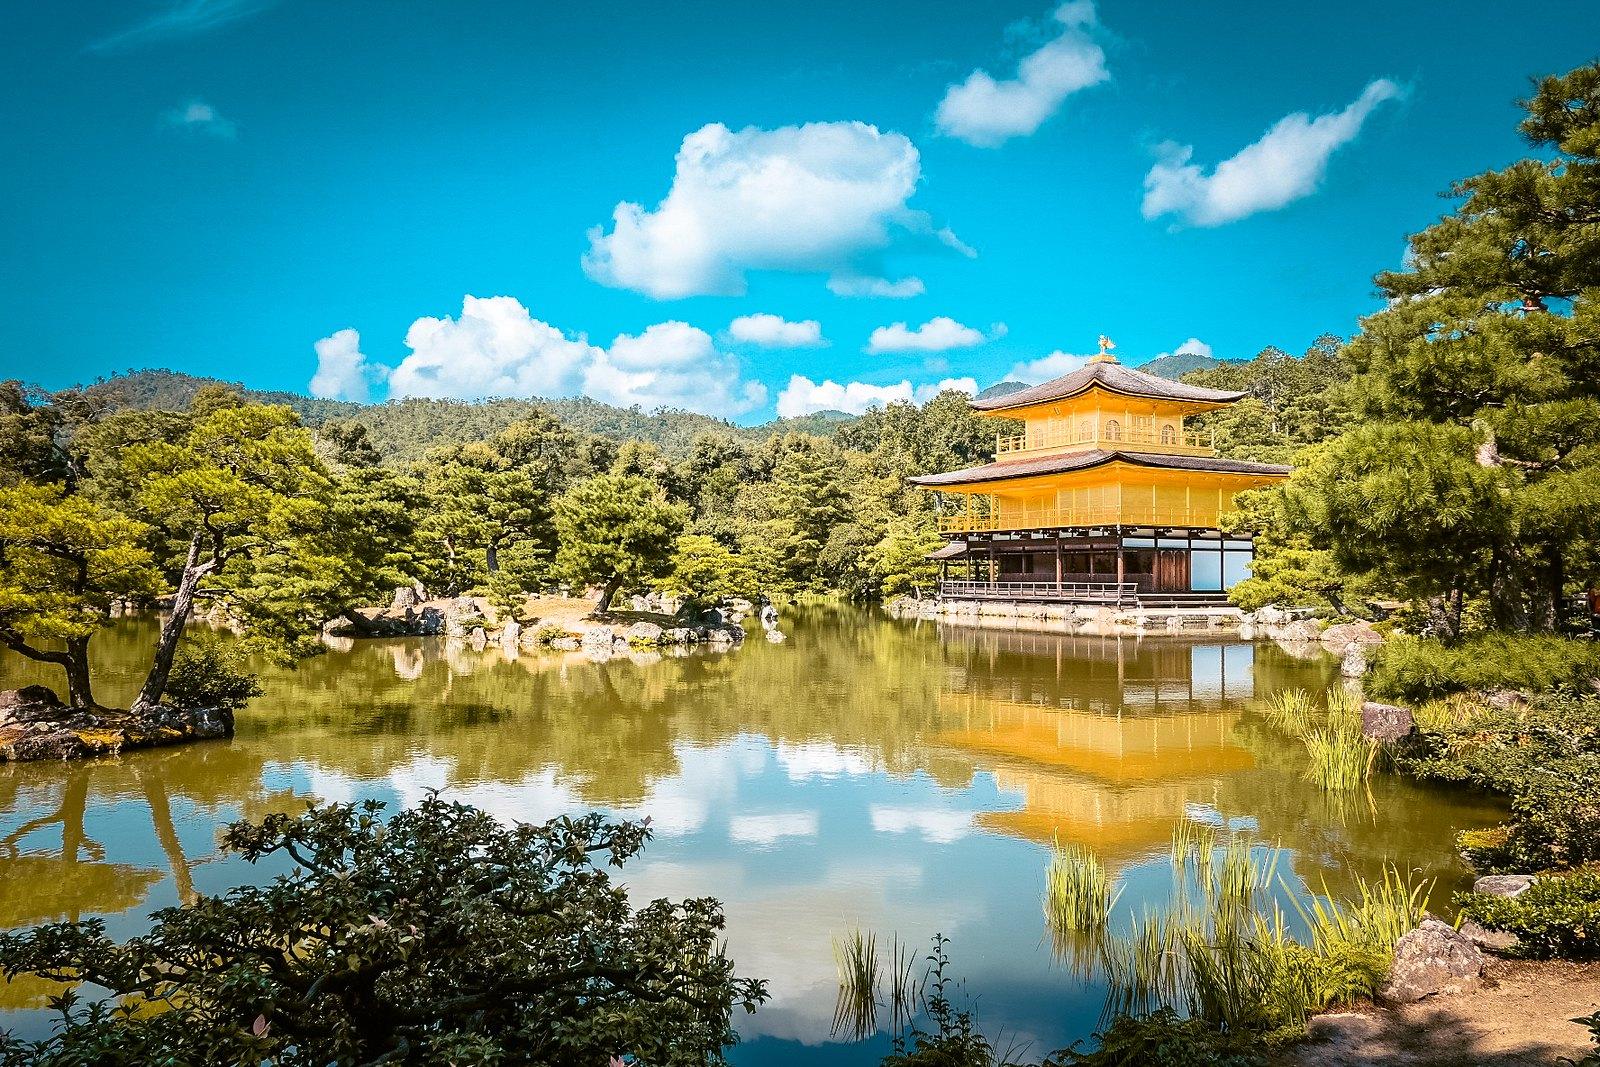 Kyoto or Osaka: Kinkakuji Temple